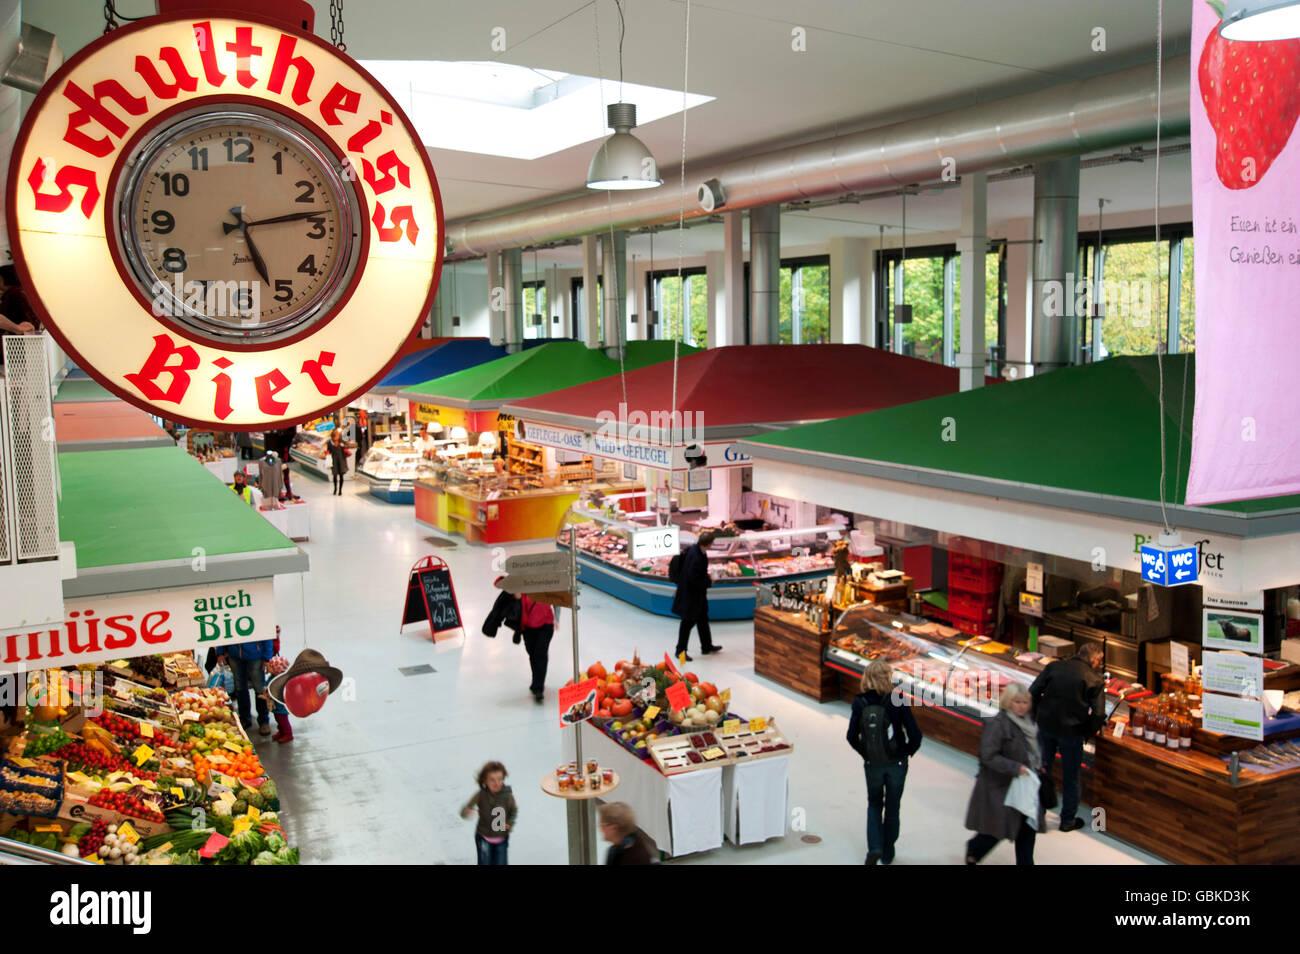 Marheineke market hall in Kreuzberg, Berlin - Stock Image